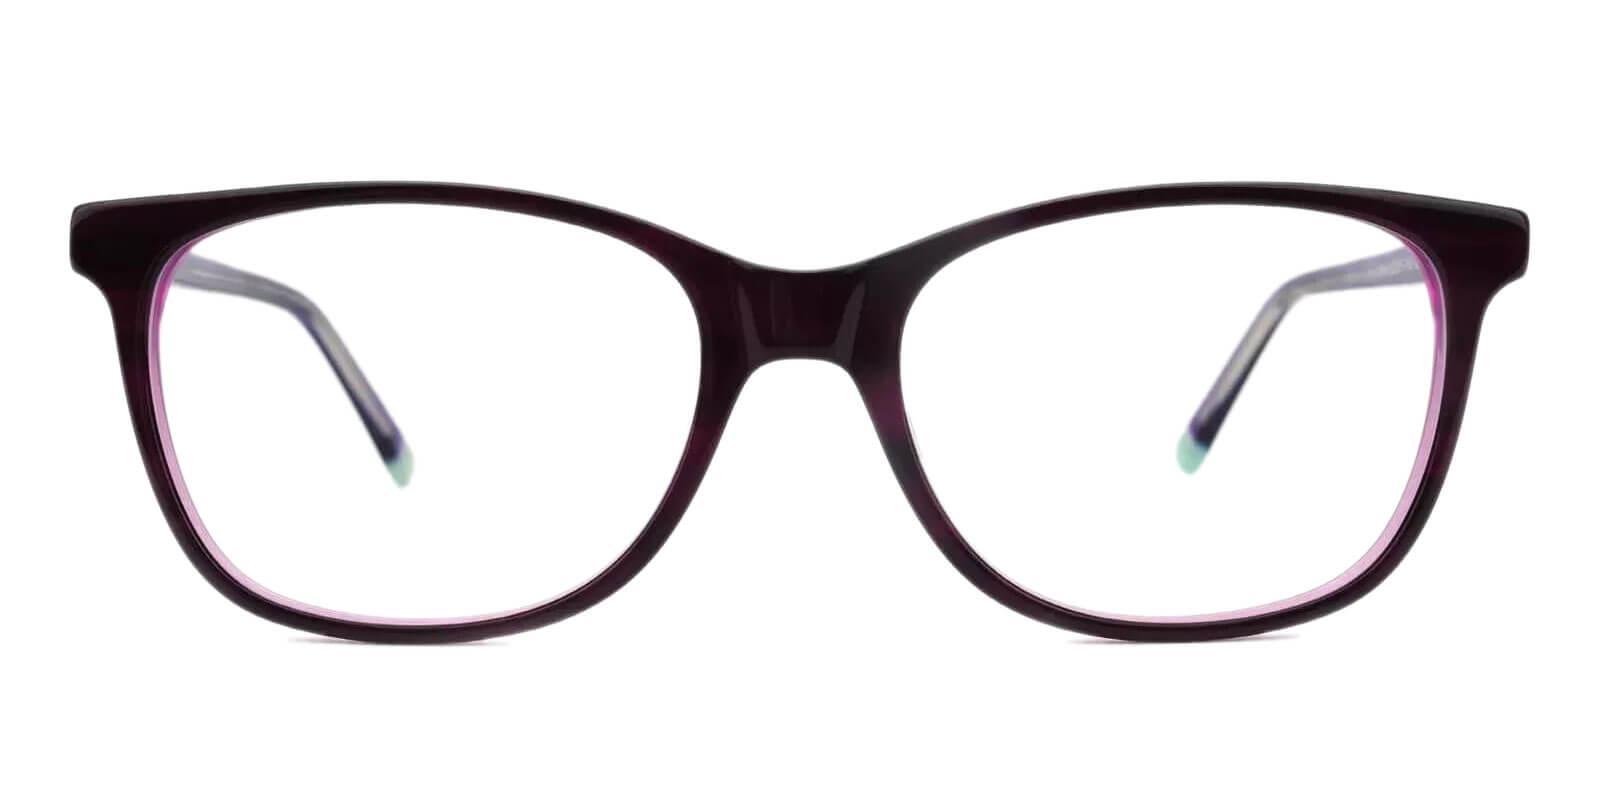 Hibbard Purple Acetate Eyeglasses , SpringHinges , UniversalBridgeFit Frames from ABBE Glasses